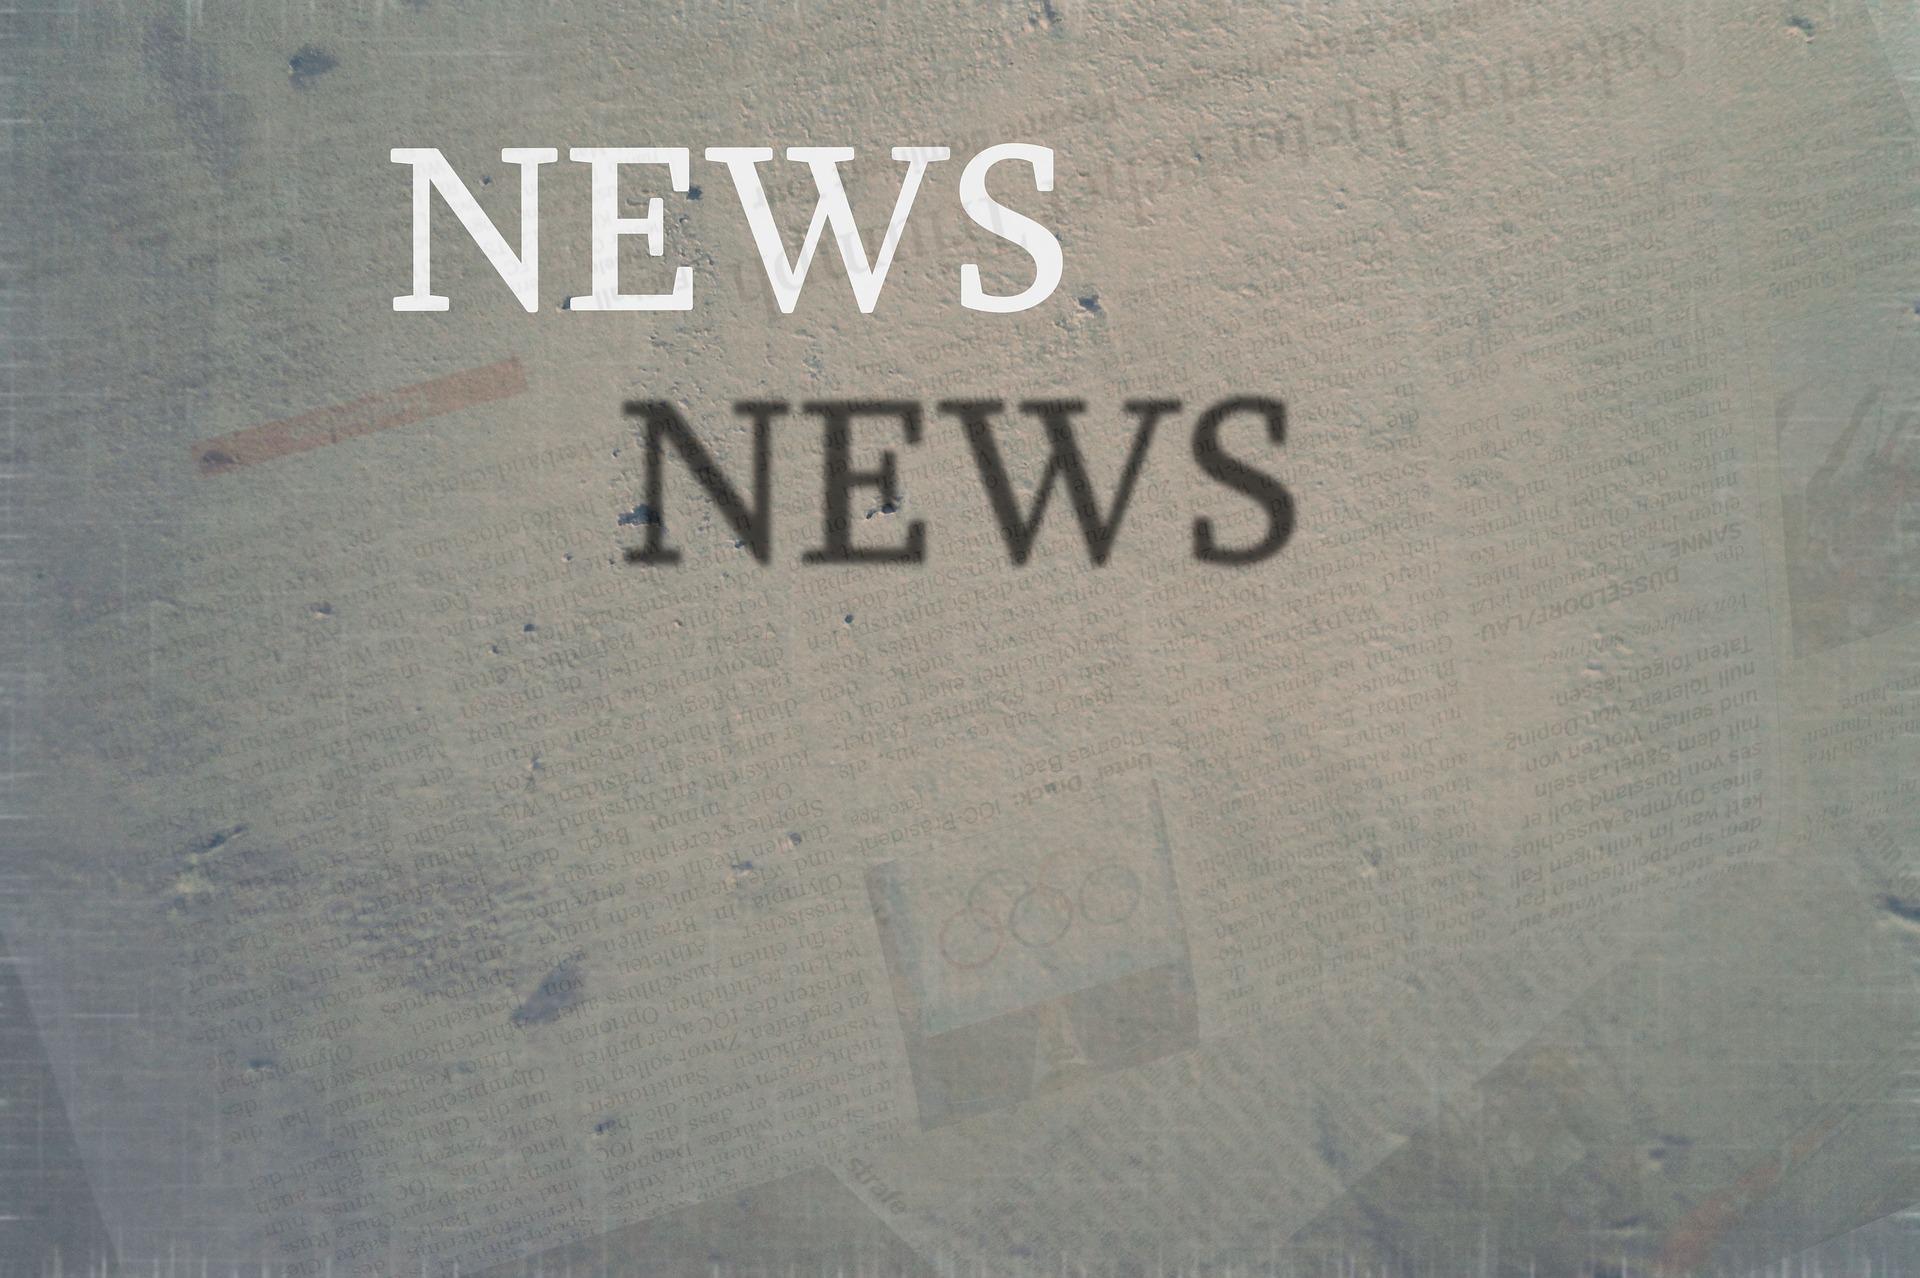 news-1546706_1920